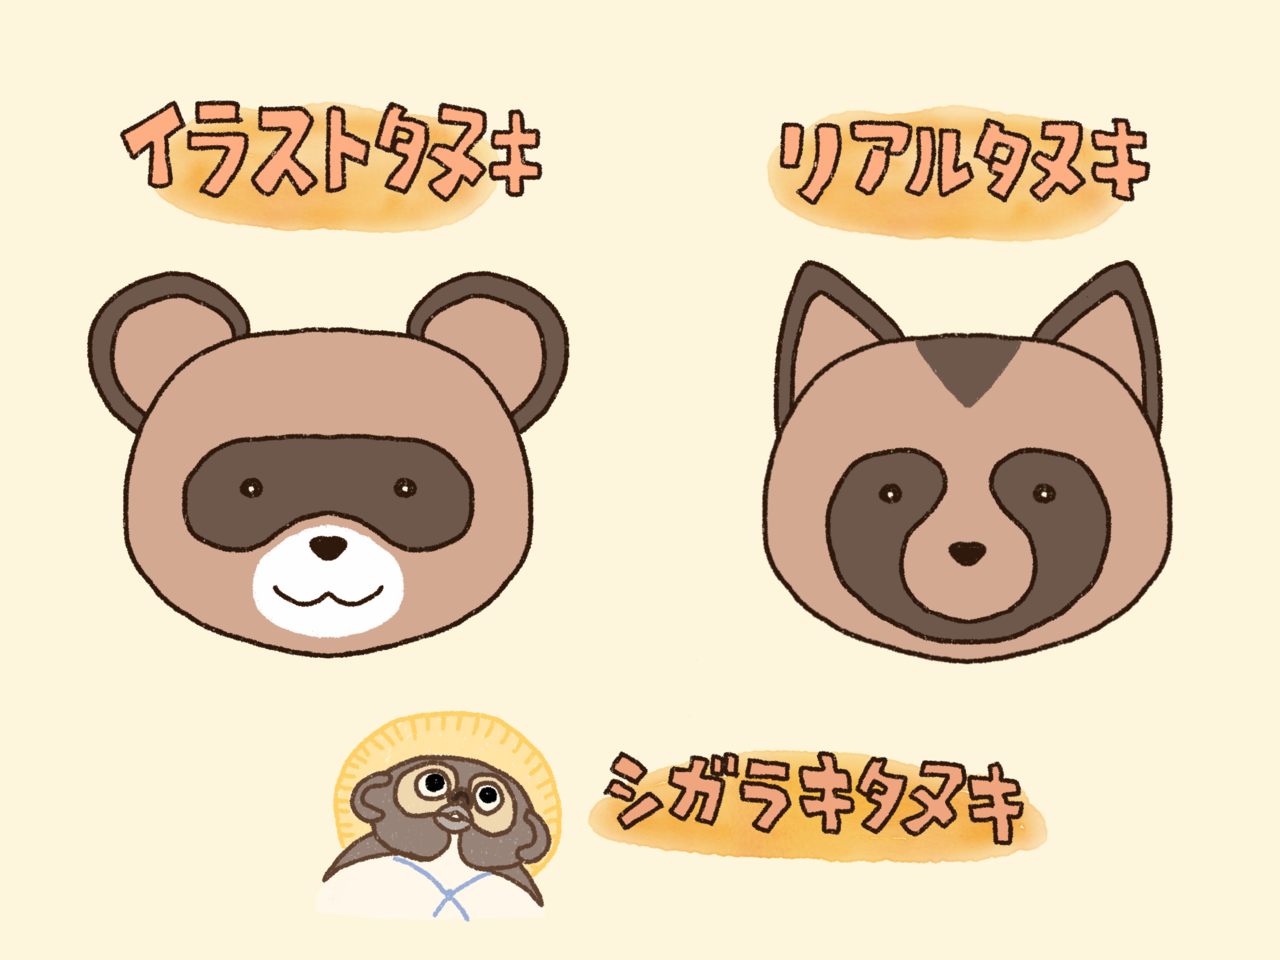 f:id:Imamura:20200419175058p:plain:w360